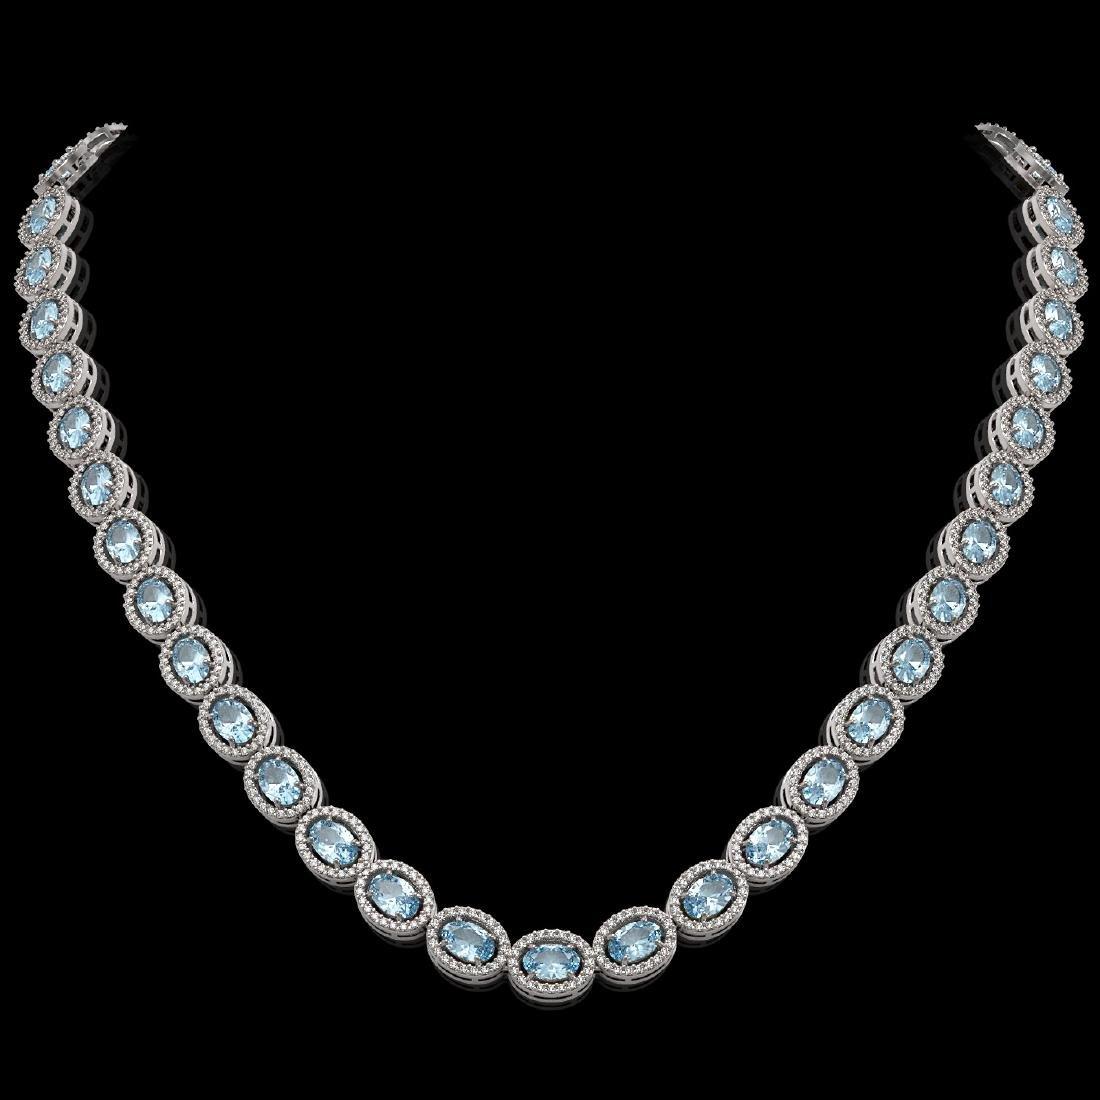 33.25 CTW Sky Topaz & Diamond Halo Necklace 10K White